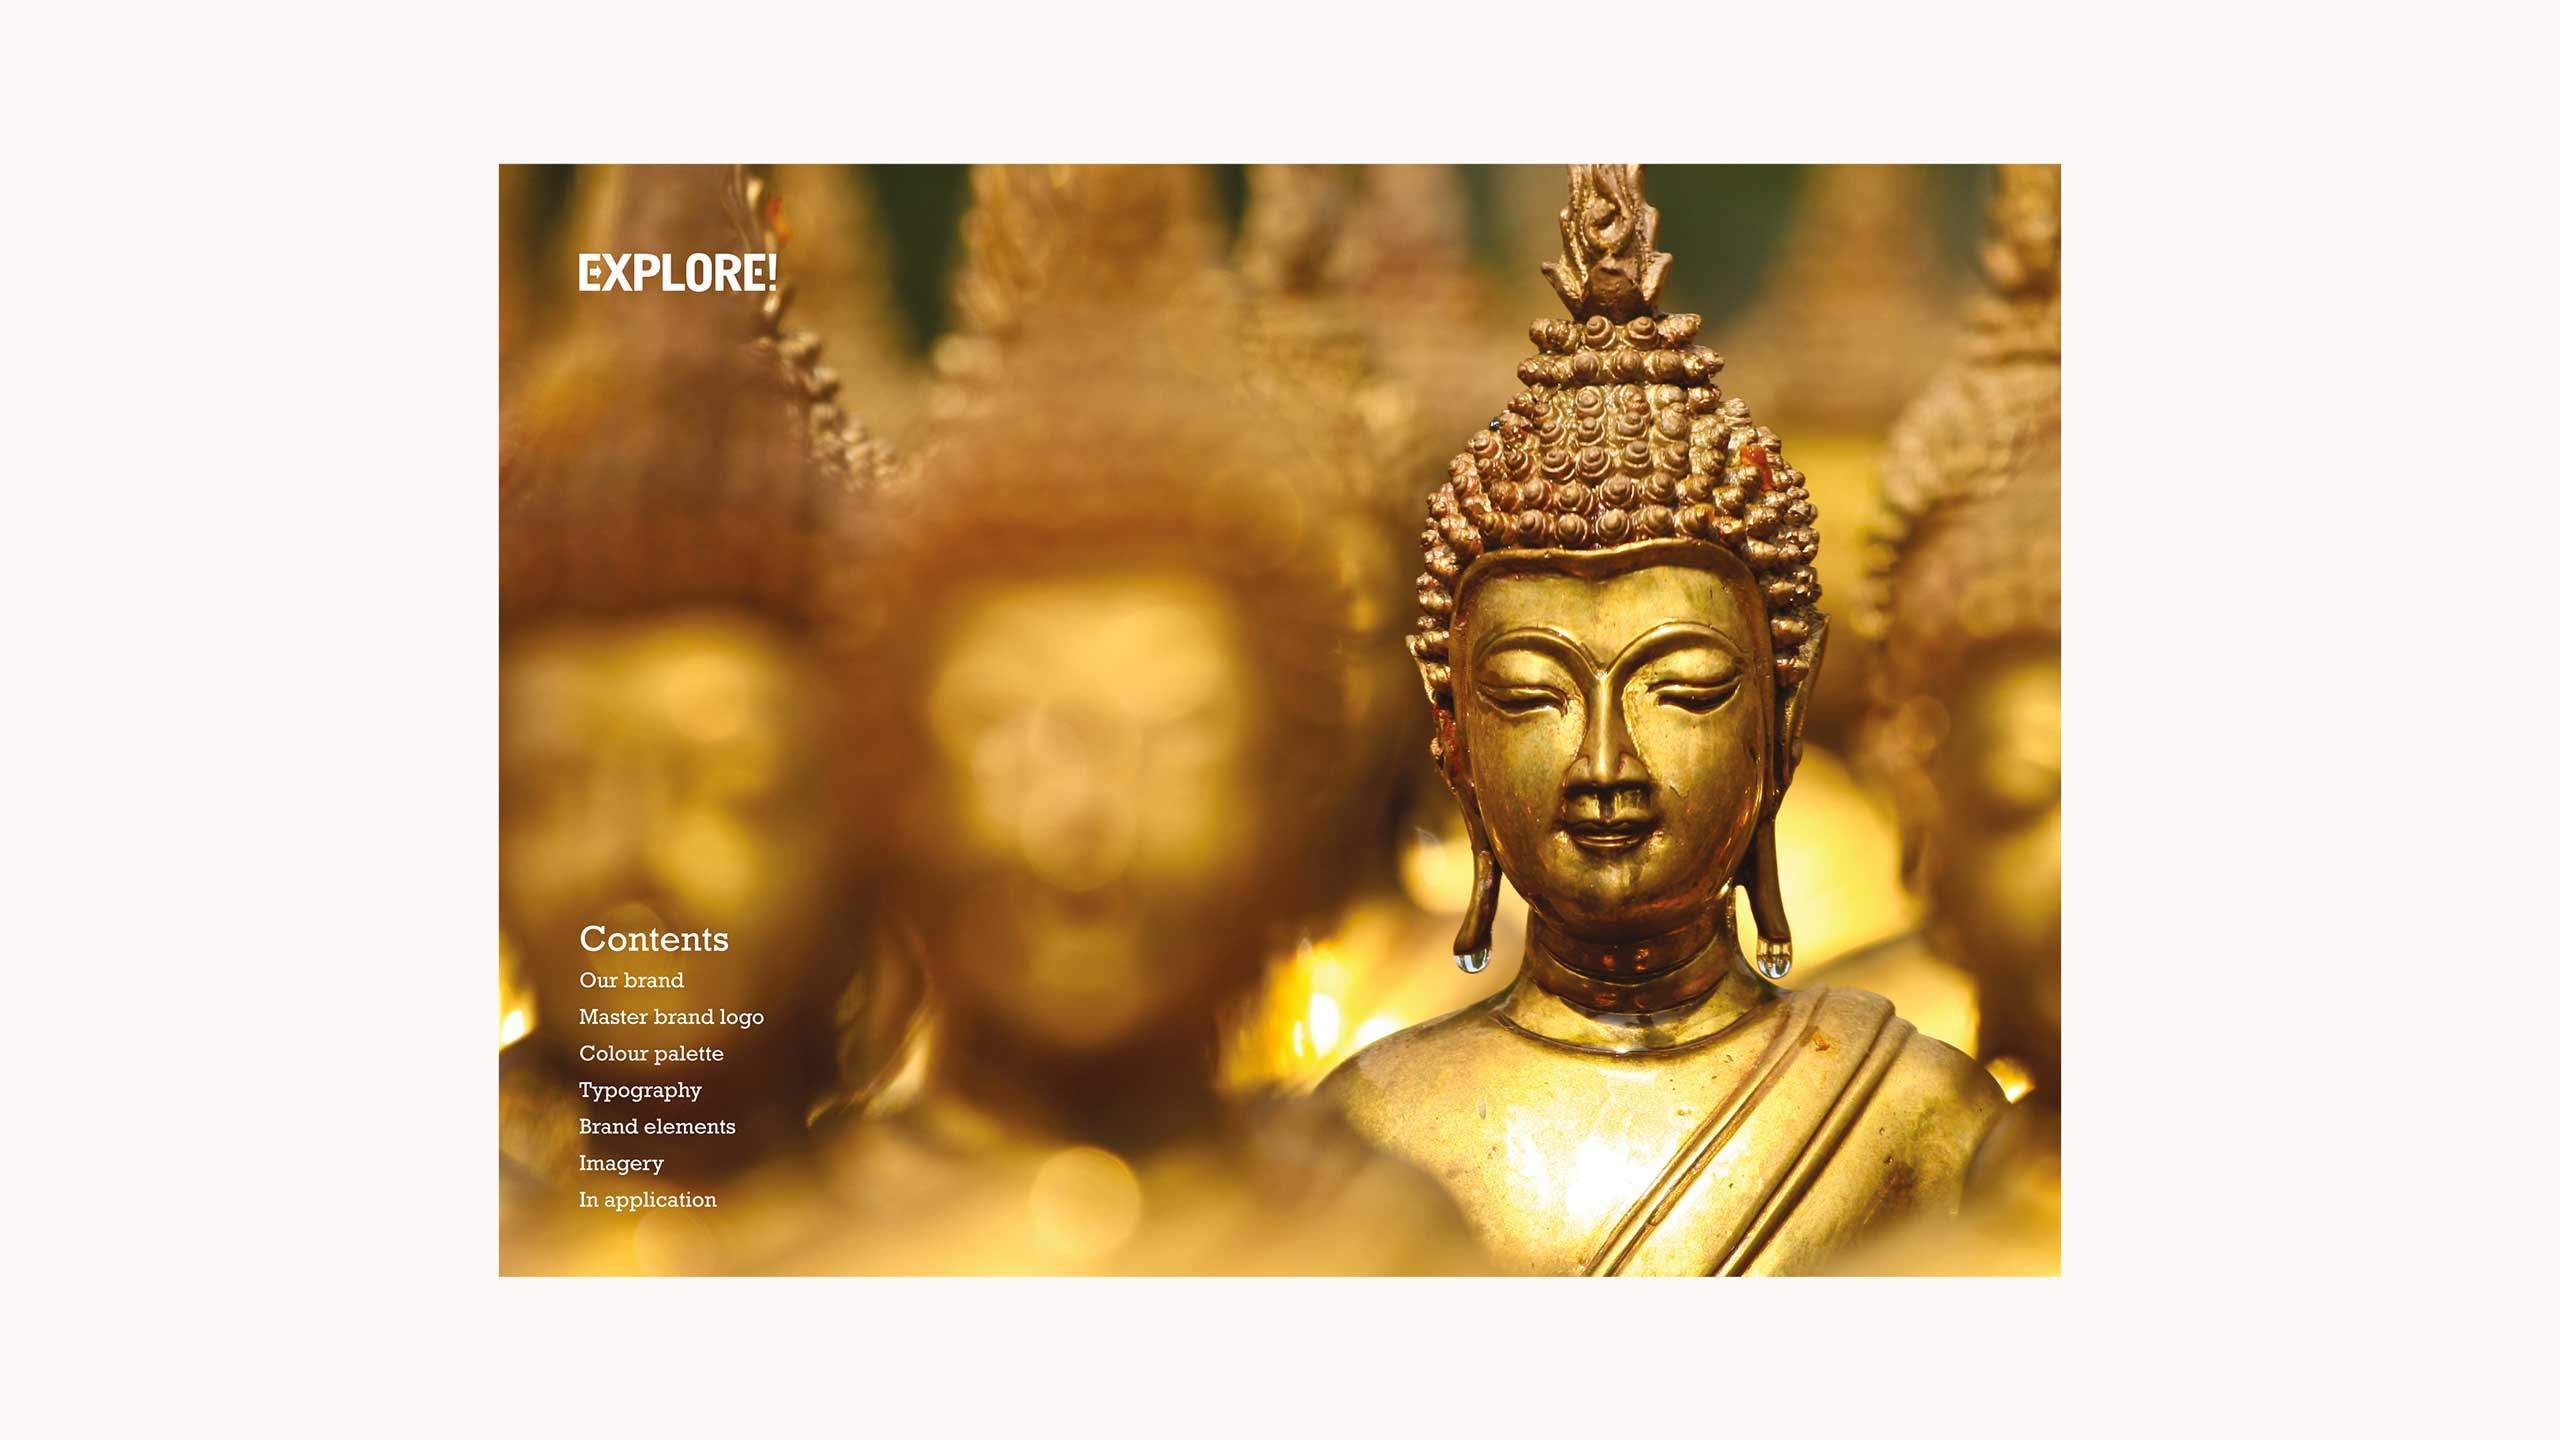 adventure travel branding brand guidelines contents explore worldwide